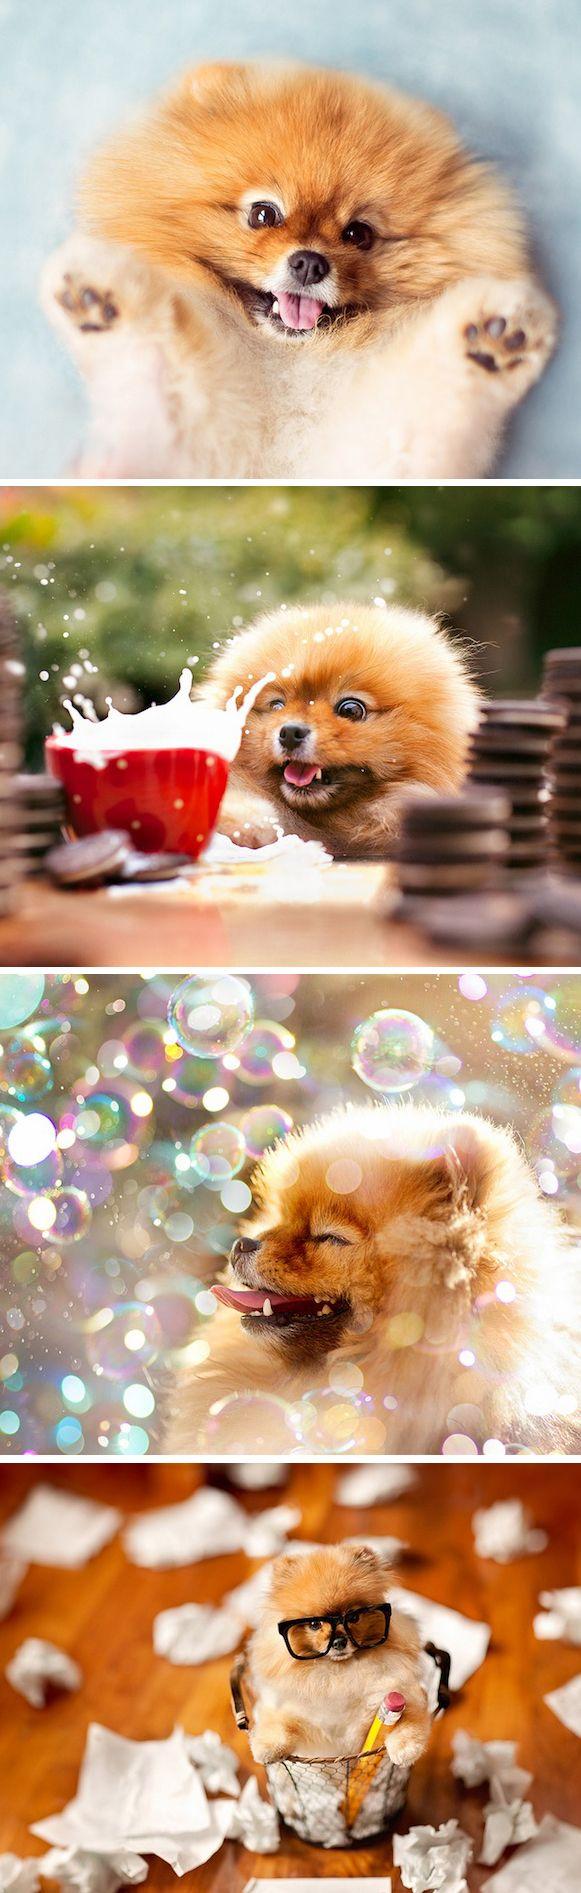 Meet Flint :) #pom #pomeranian #puppy